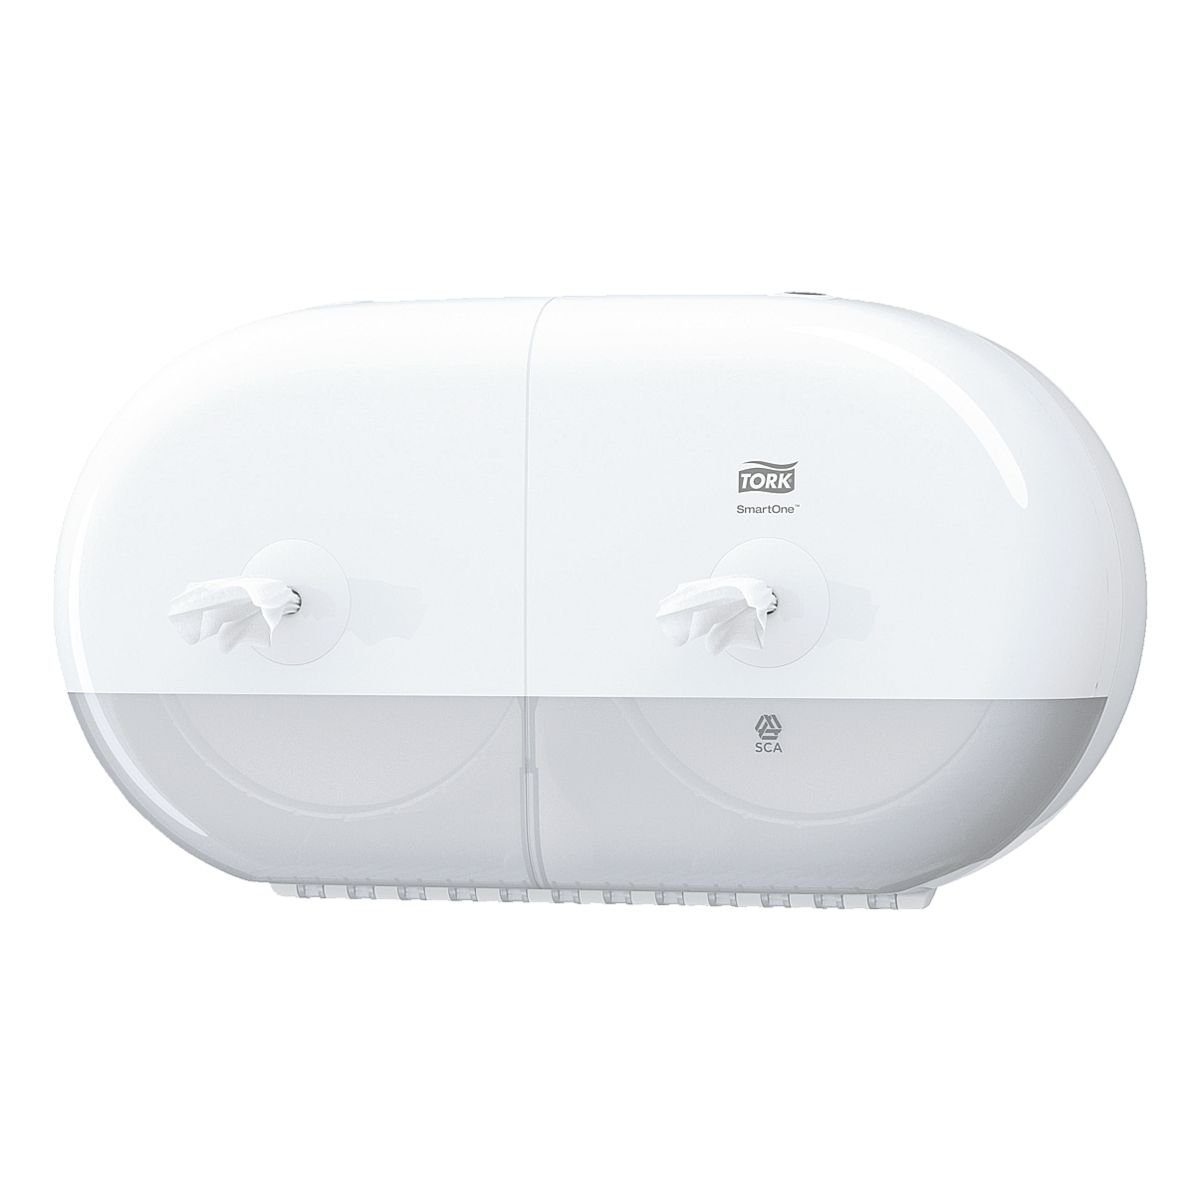 TORK Toilettenpapier-Doppelrollenspender »SmartOne® mini«